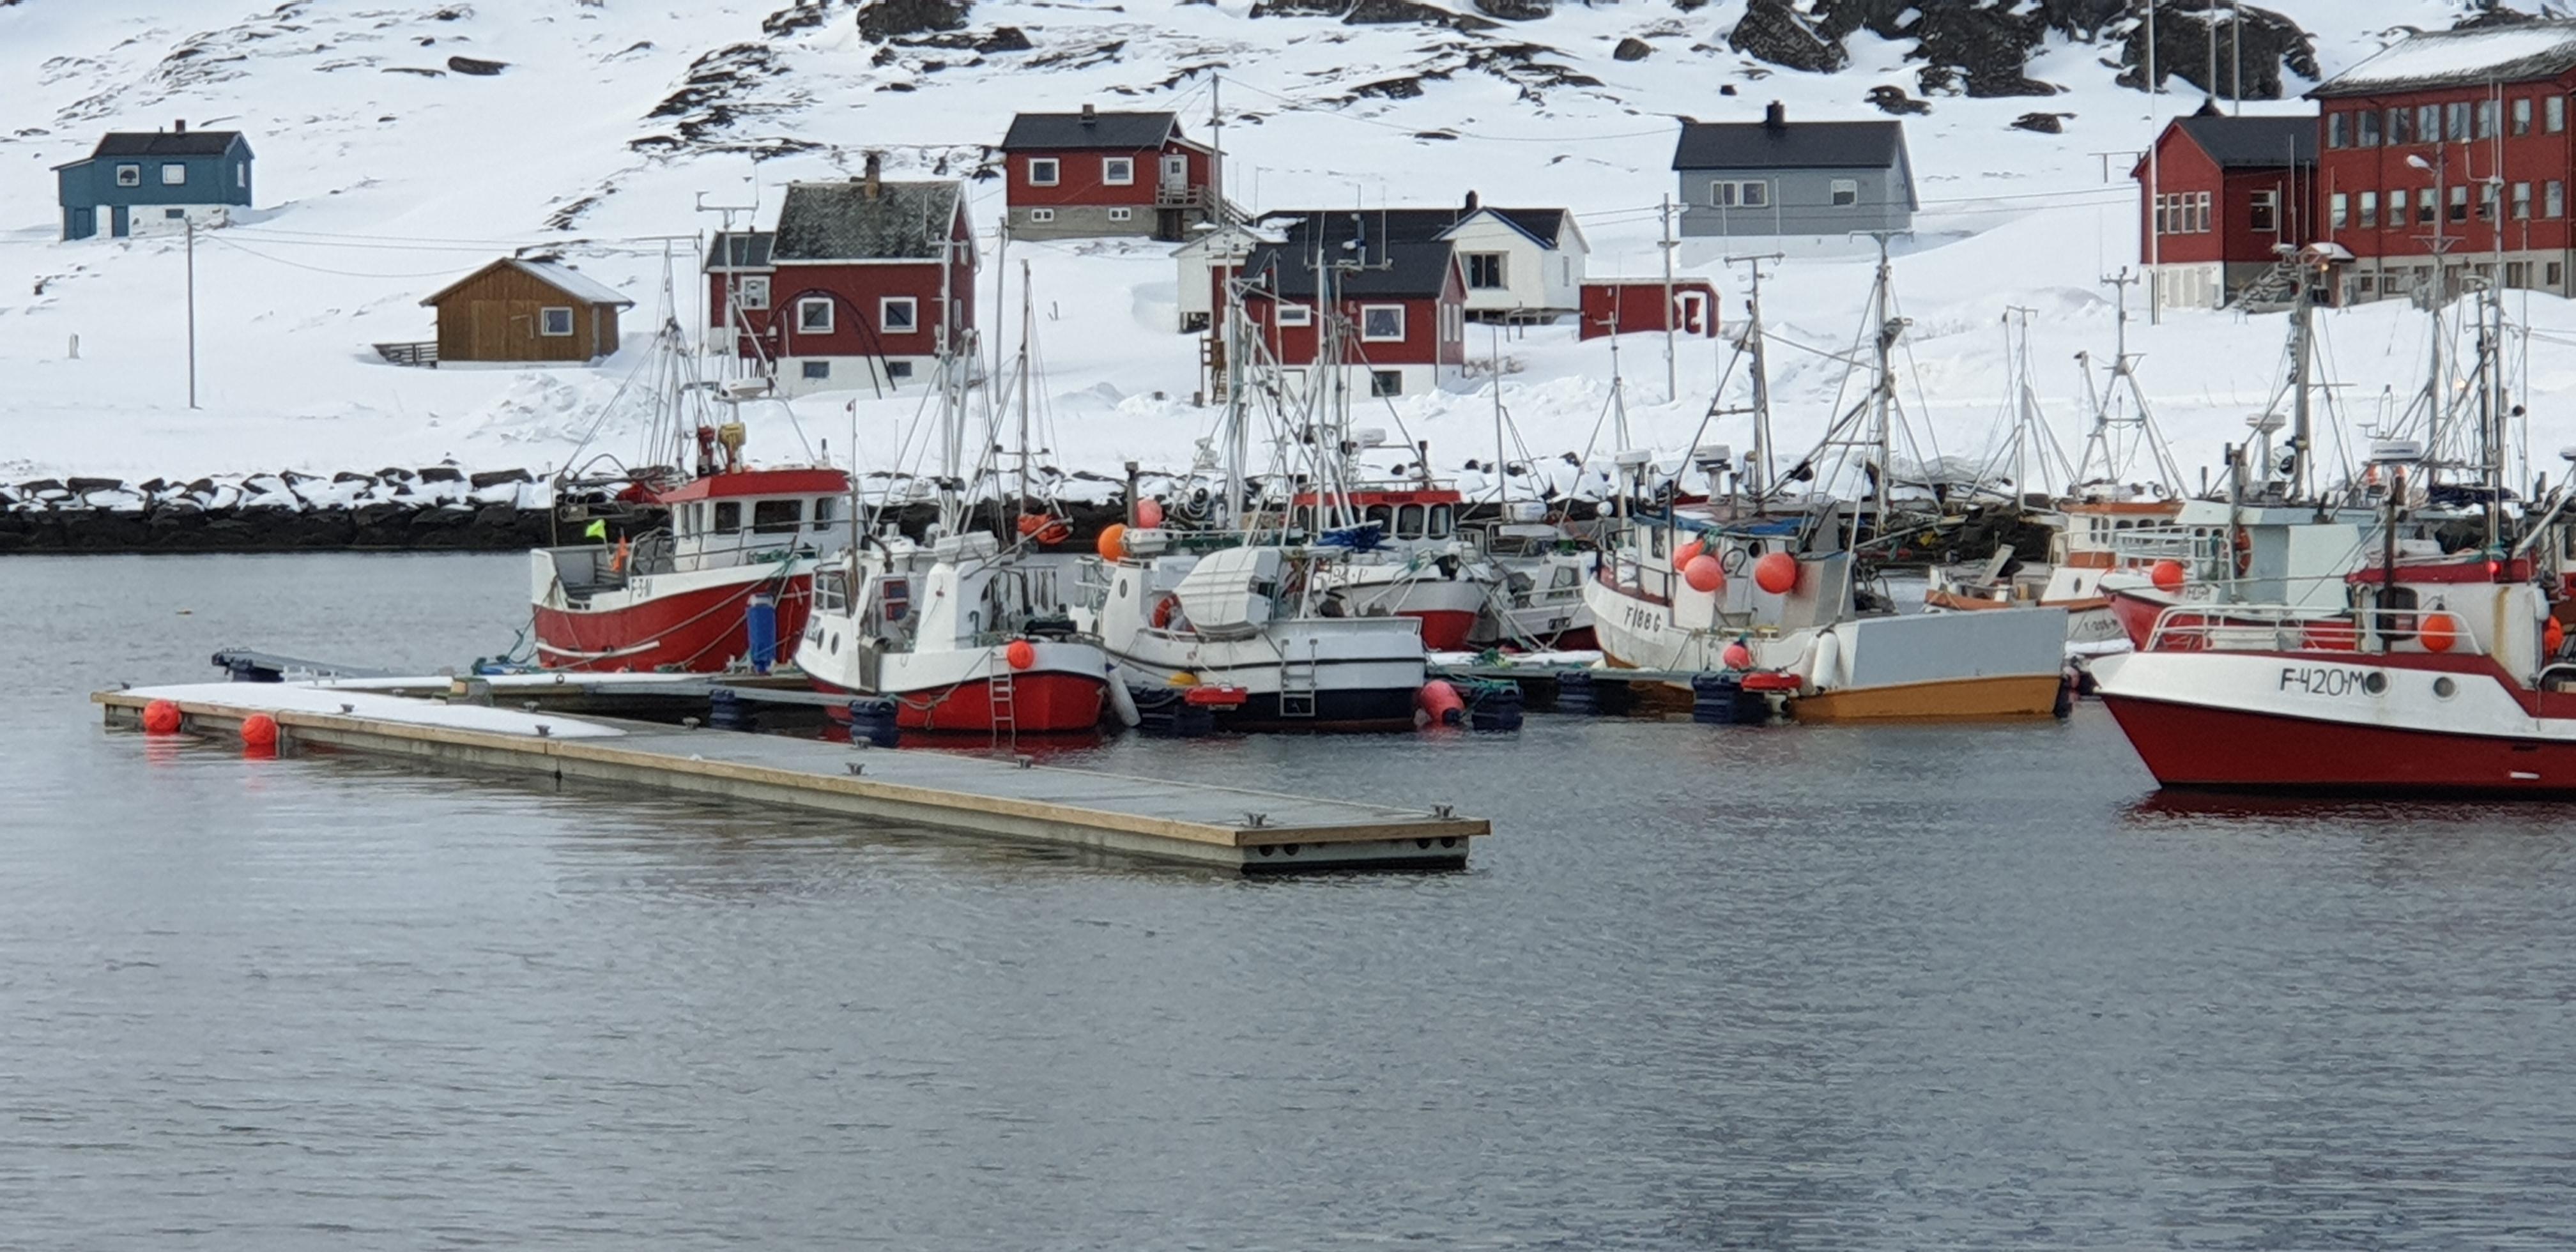 https://marinasolutions.no/uploads/20190402_095210-Ingøya-Foto-Per-Ronny-Vestli_2020-12-01-083001.jpg